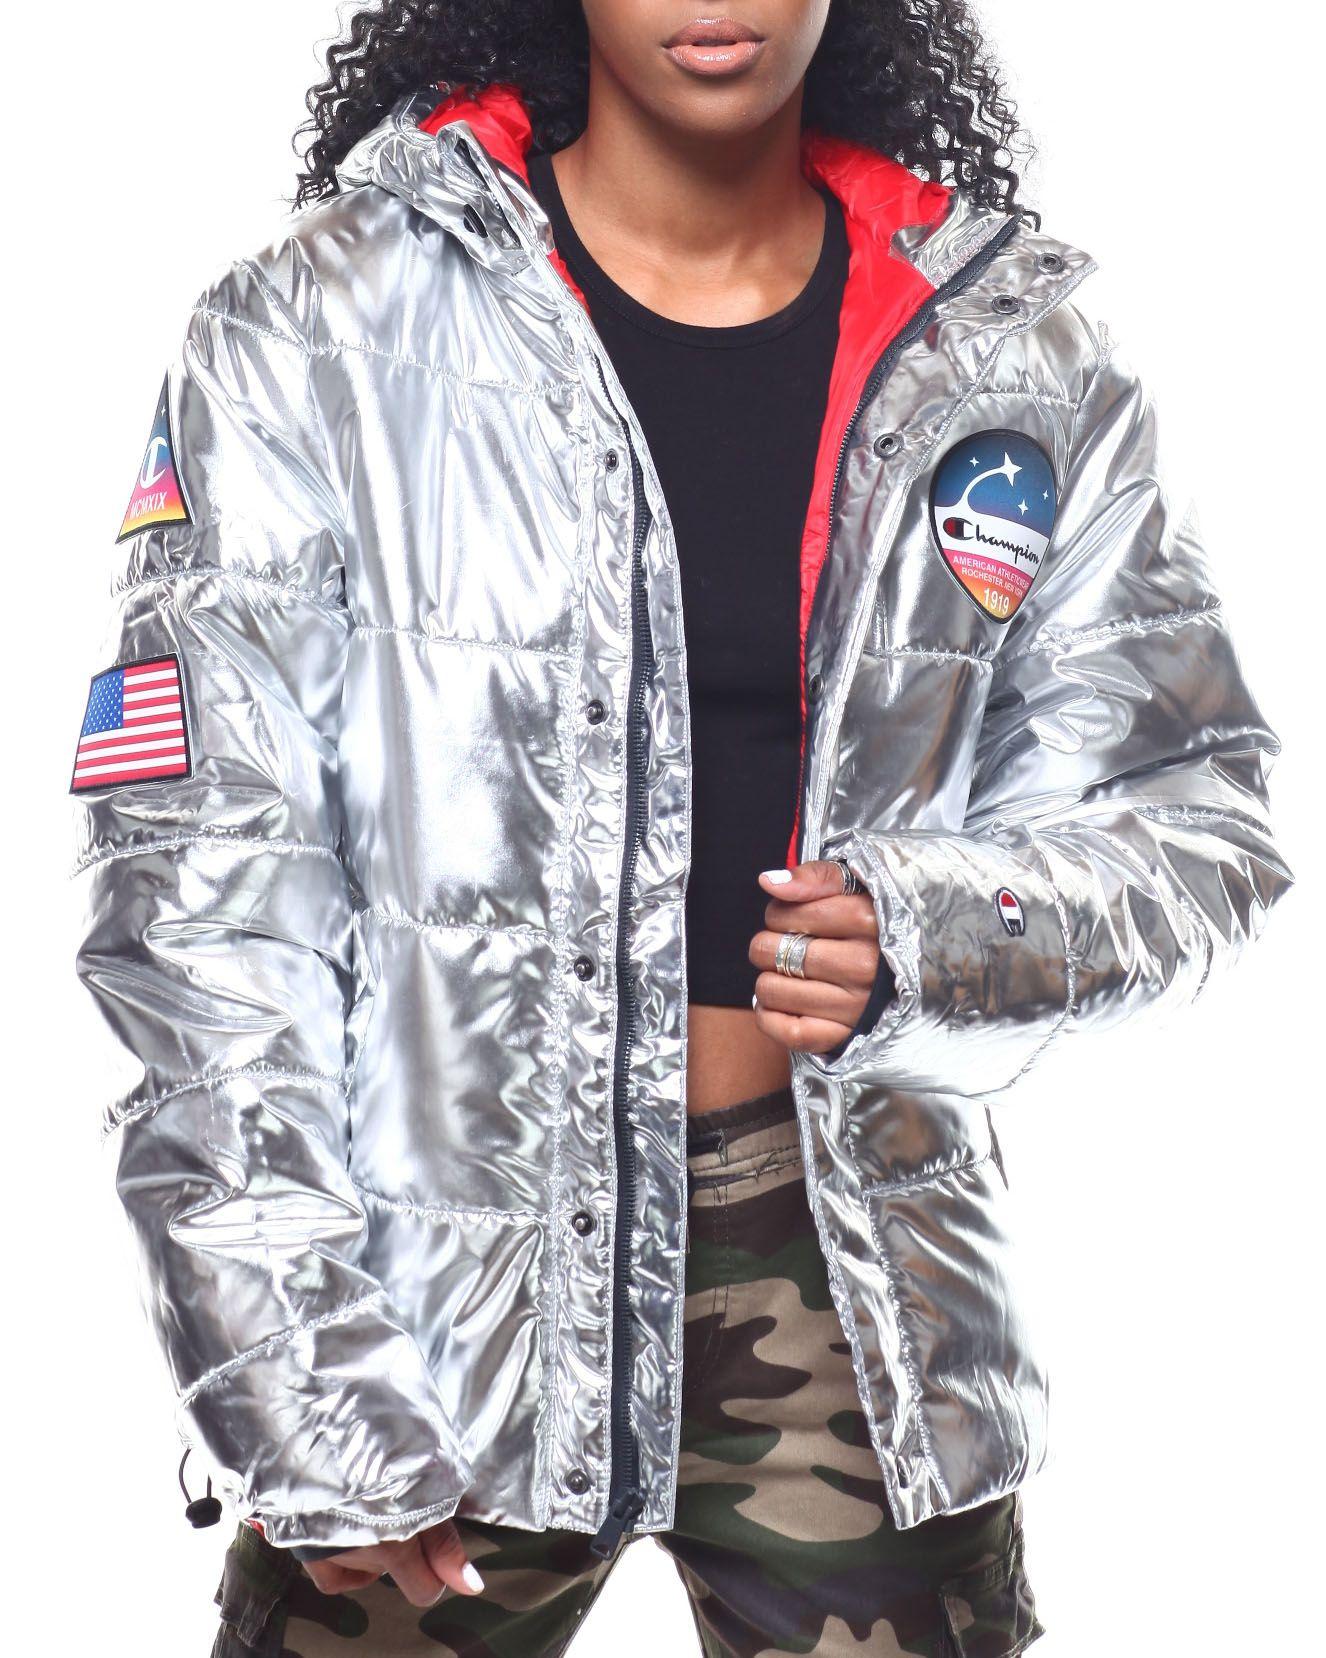 Metallic Puffer Jacket From Champion At Drjays Com Puffer Jacket Women Outerwear Women Jackets [ 1658 x 1326 Pixel ]